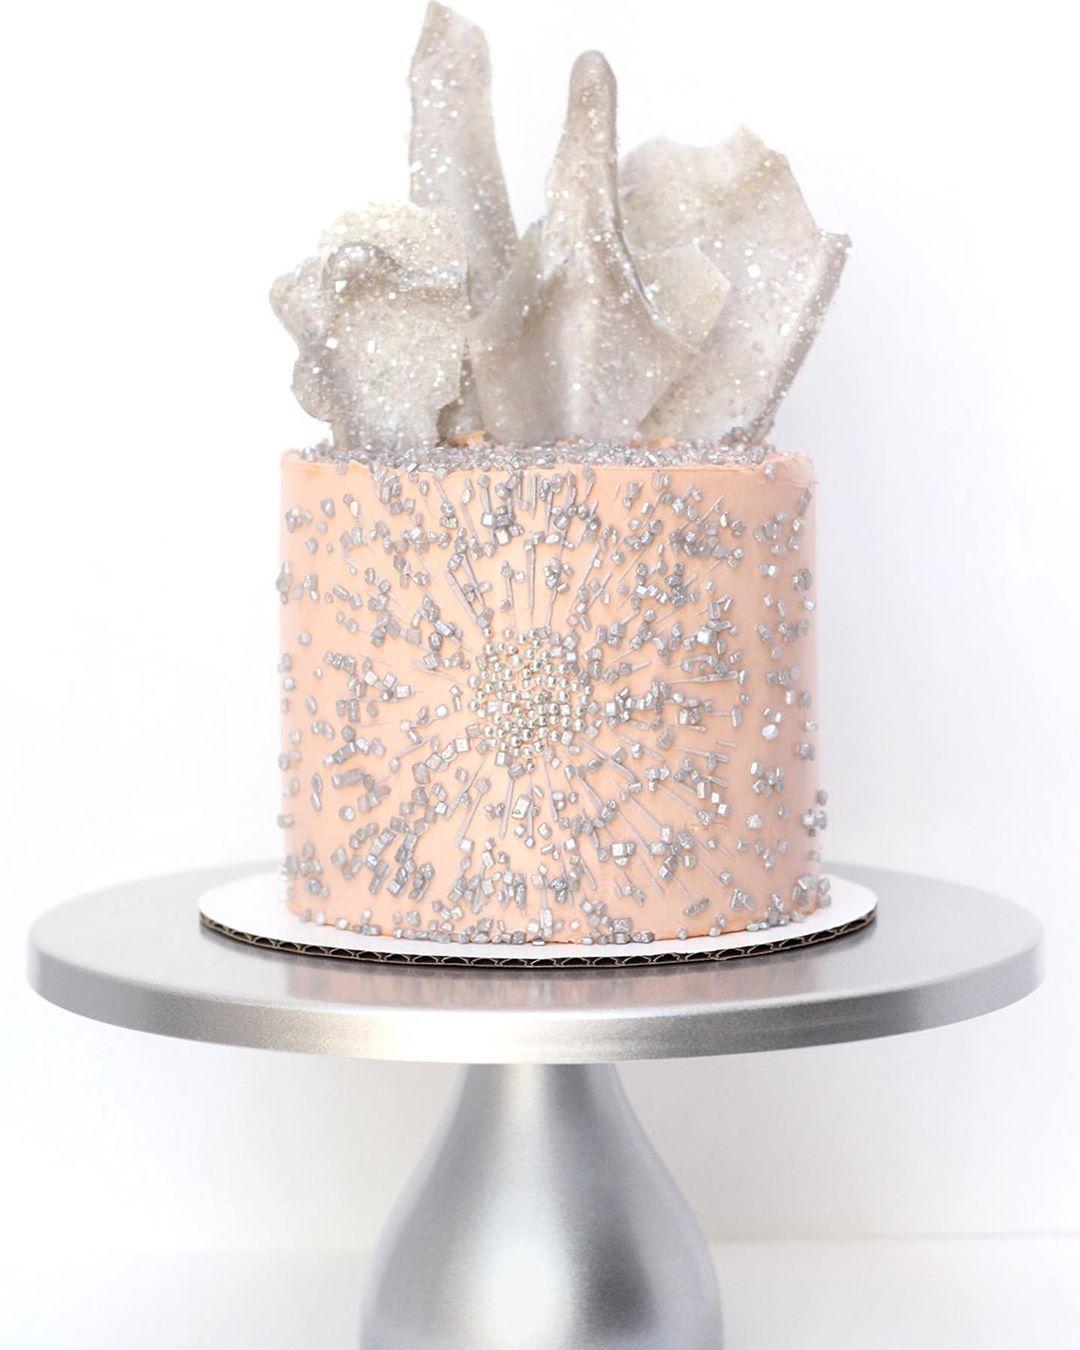 Silver Crush Sprinkles Sugar Crystals Cake Cupcake Cookie Sparkles Edible